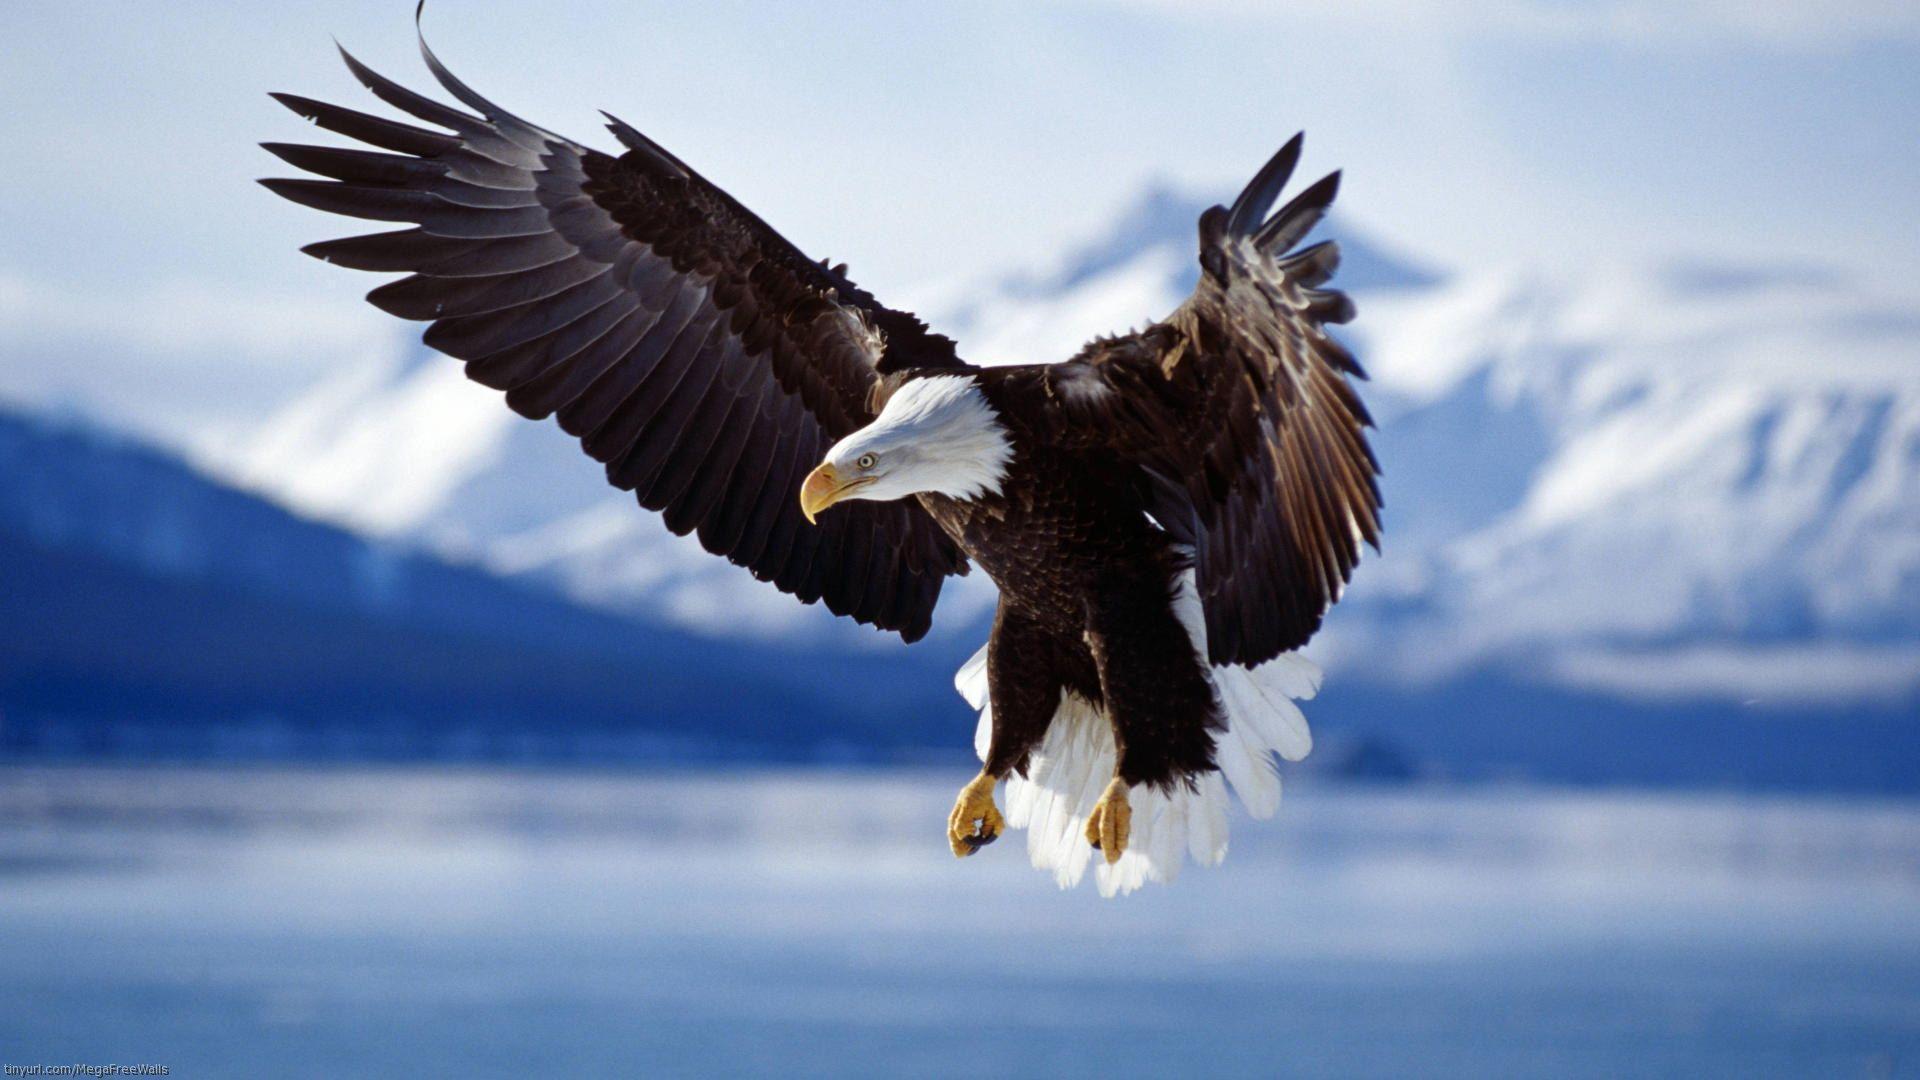 Eagle Wallpaper Photo Choices For Your Desktop